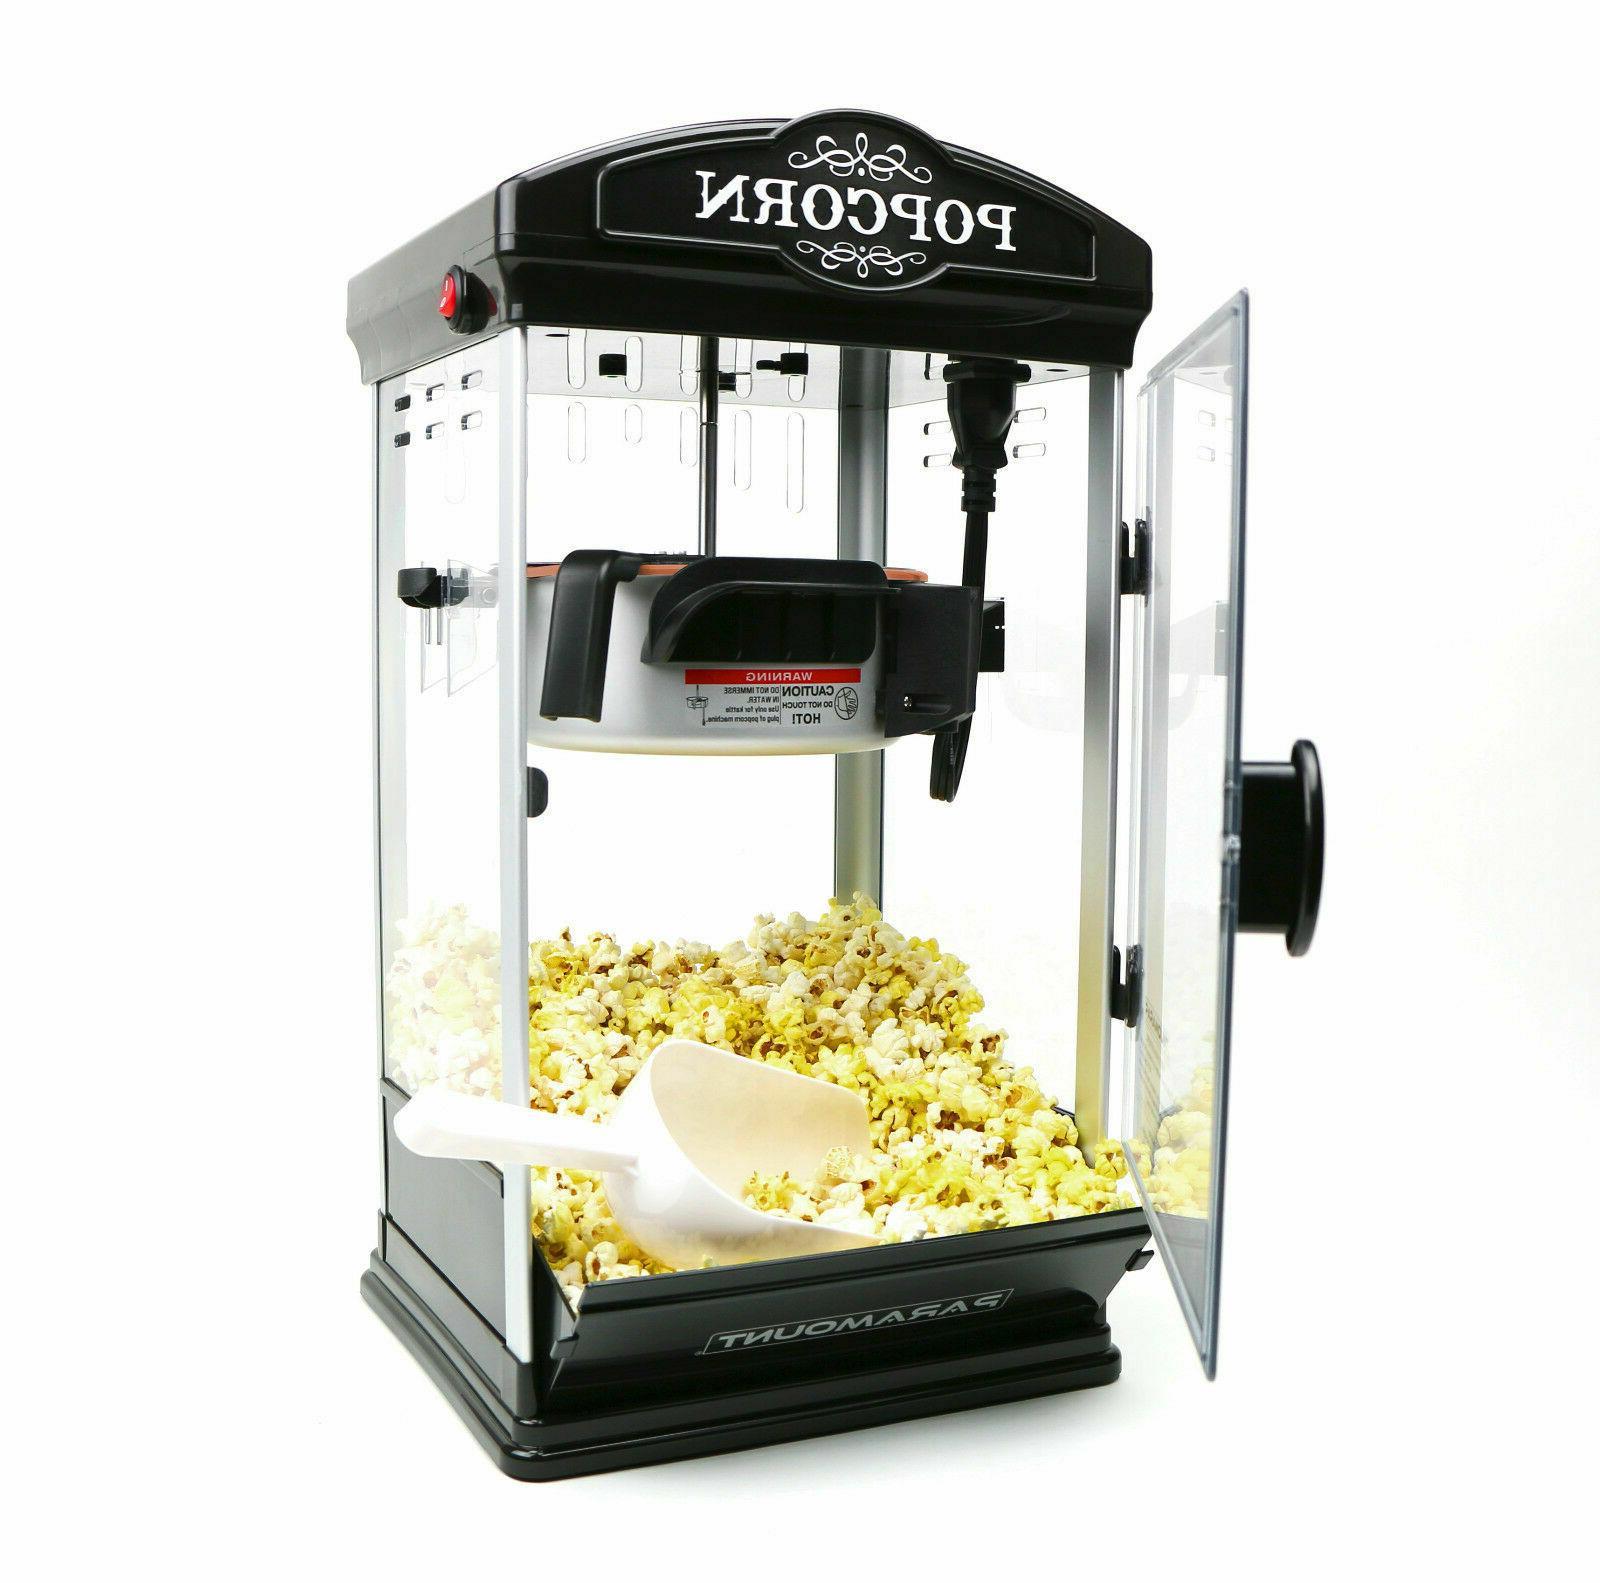 8oz black popcorn maker machine capacity theater